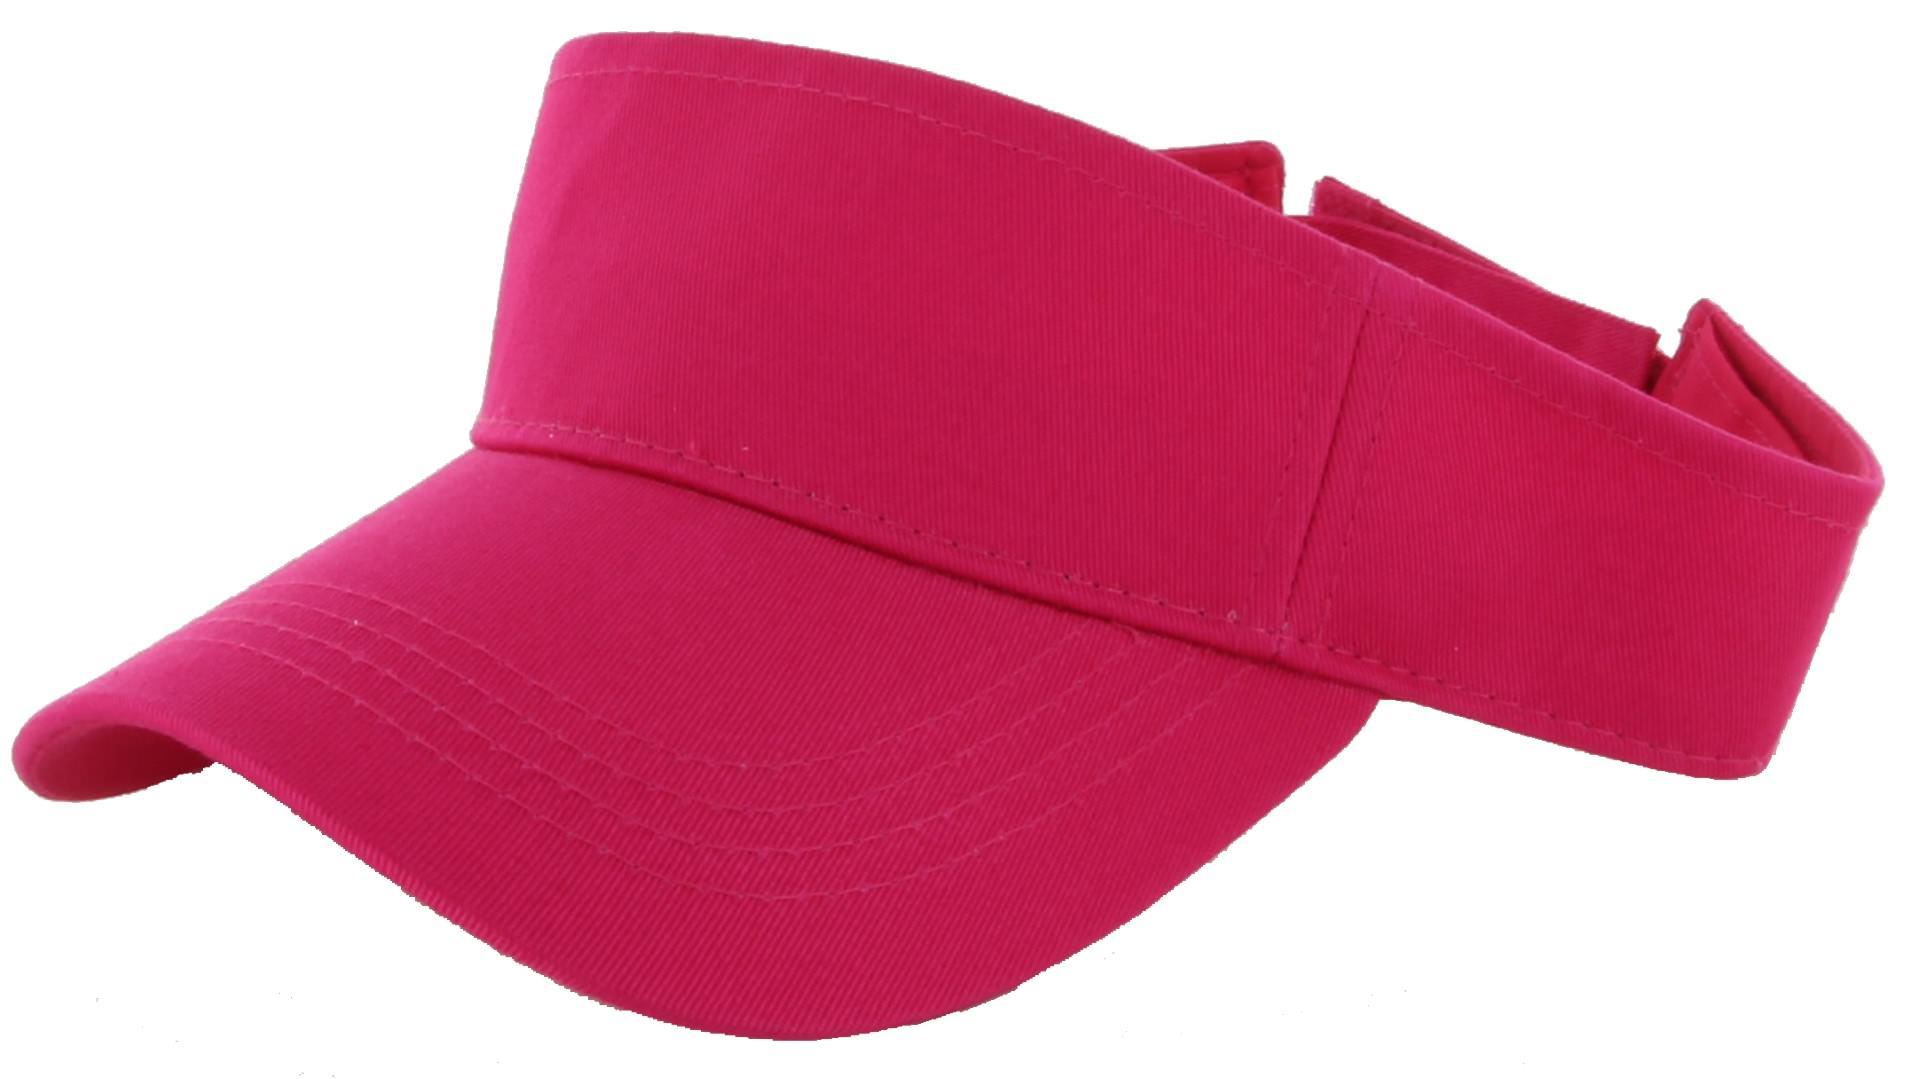 Visor Sun Plain Hat Sports Cap Colors Golf Tennis Beach New.